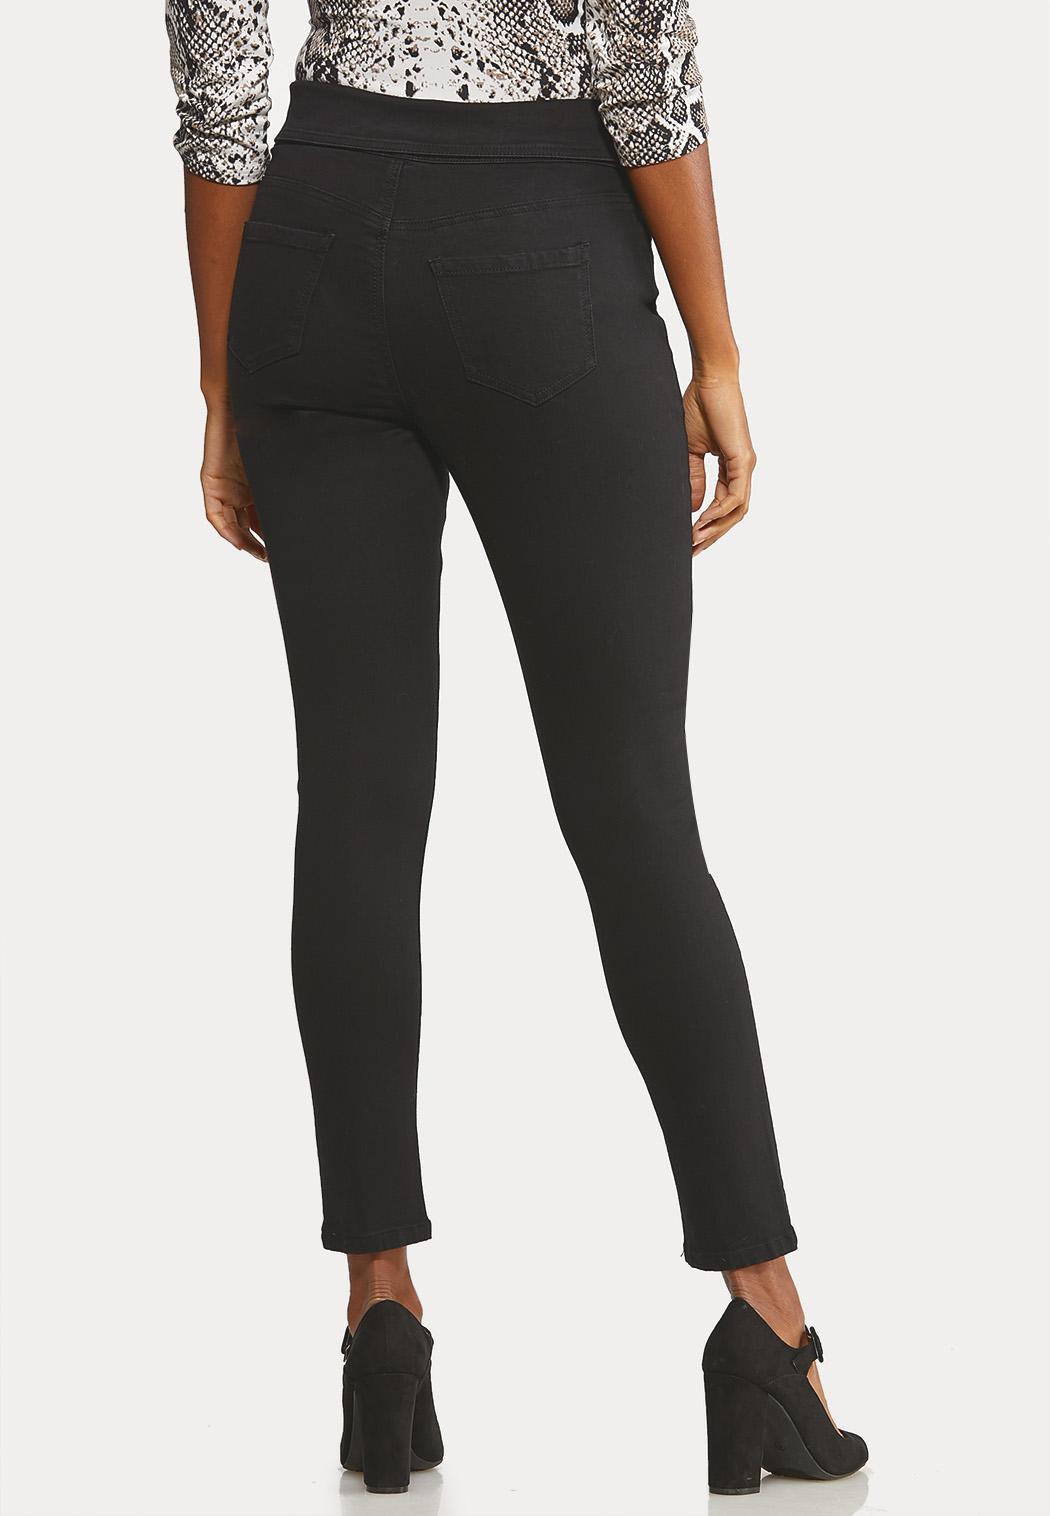 Fold Over Skinny Jeans (Item #44050764)